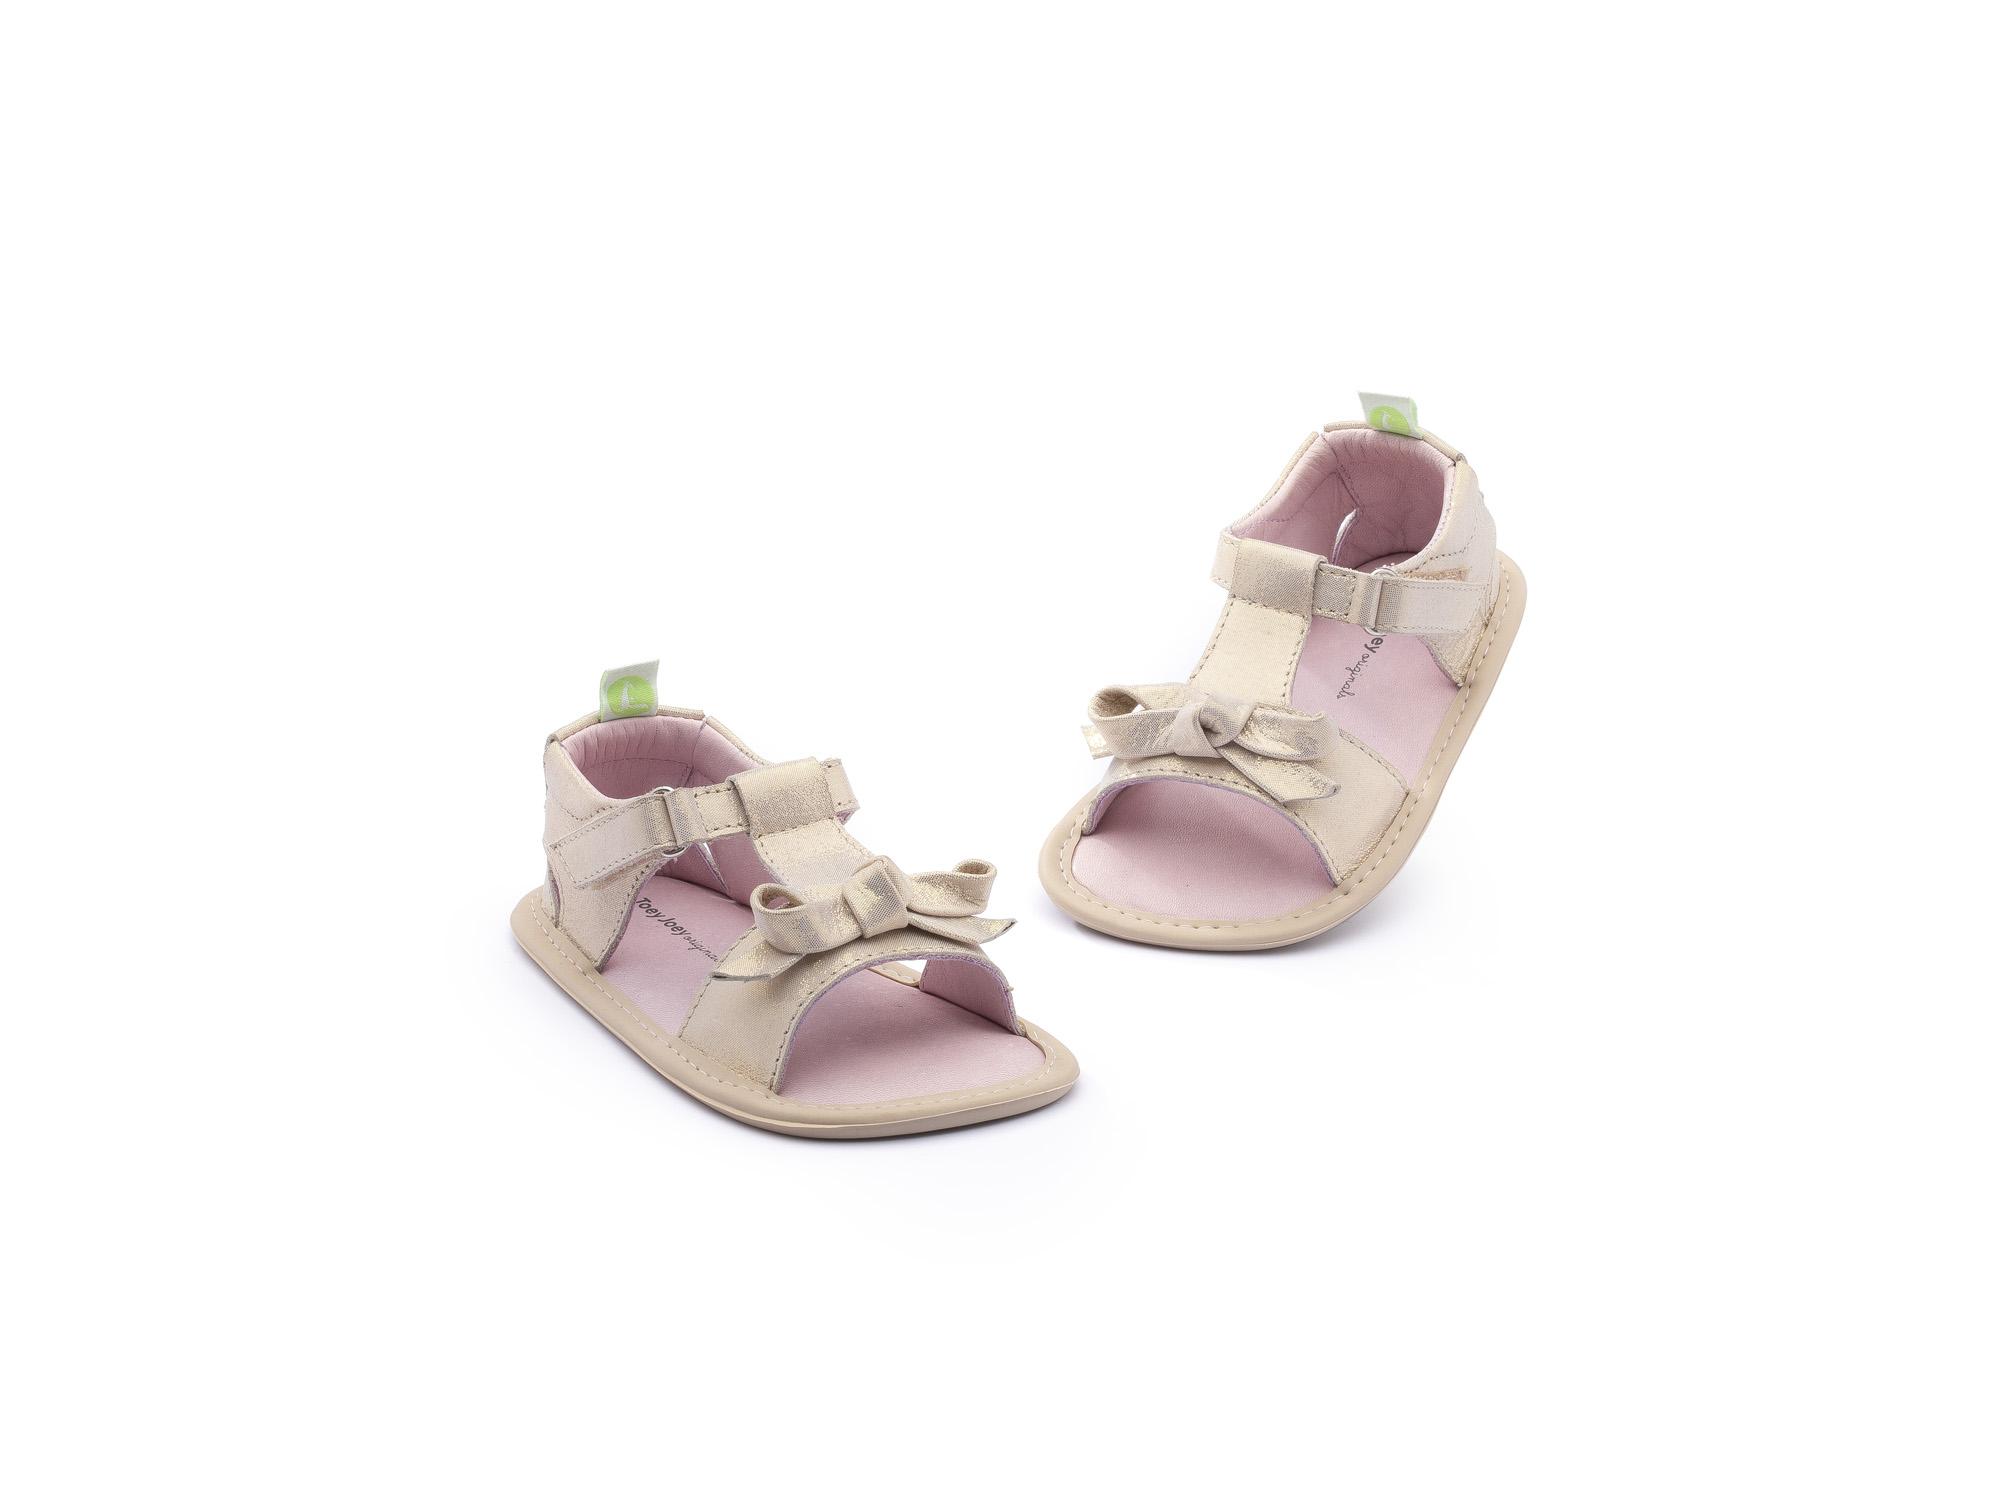 Sandália Whimsy Cotton Candy Foil Baby 0 à 2 anos - 3